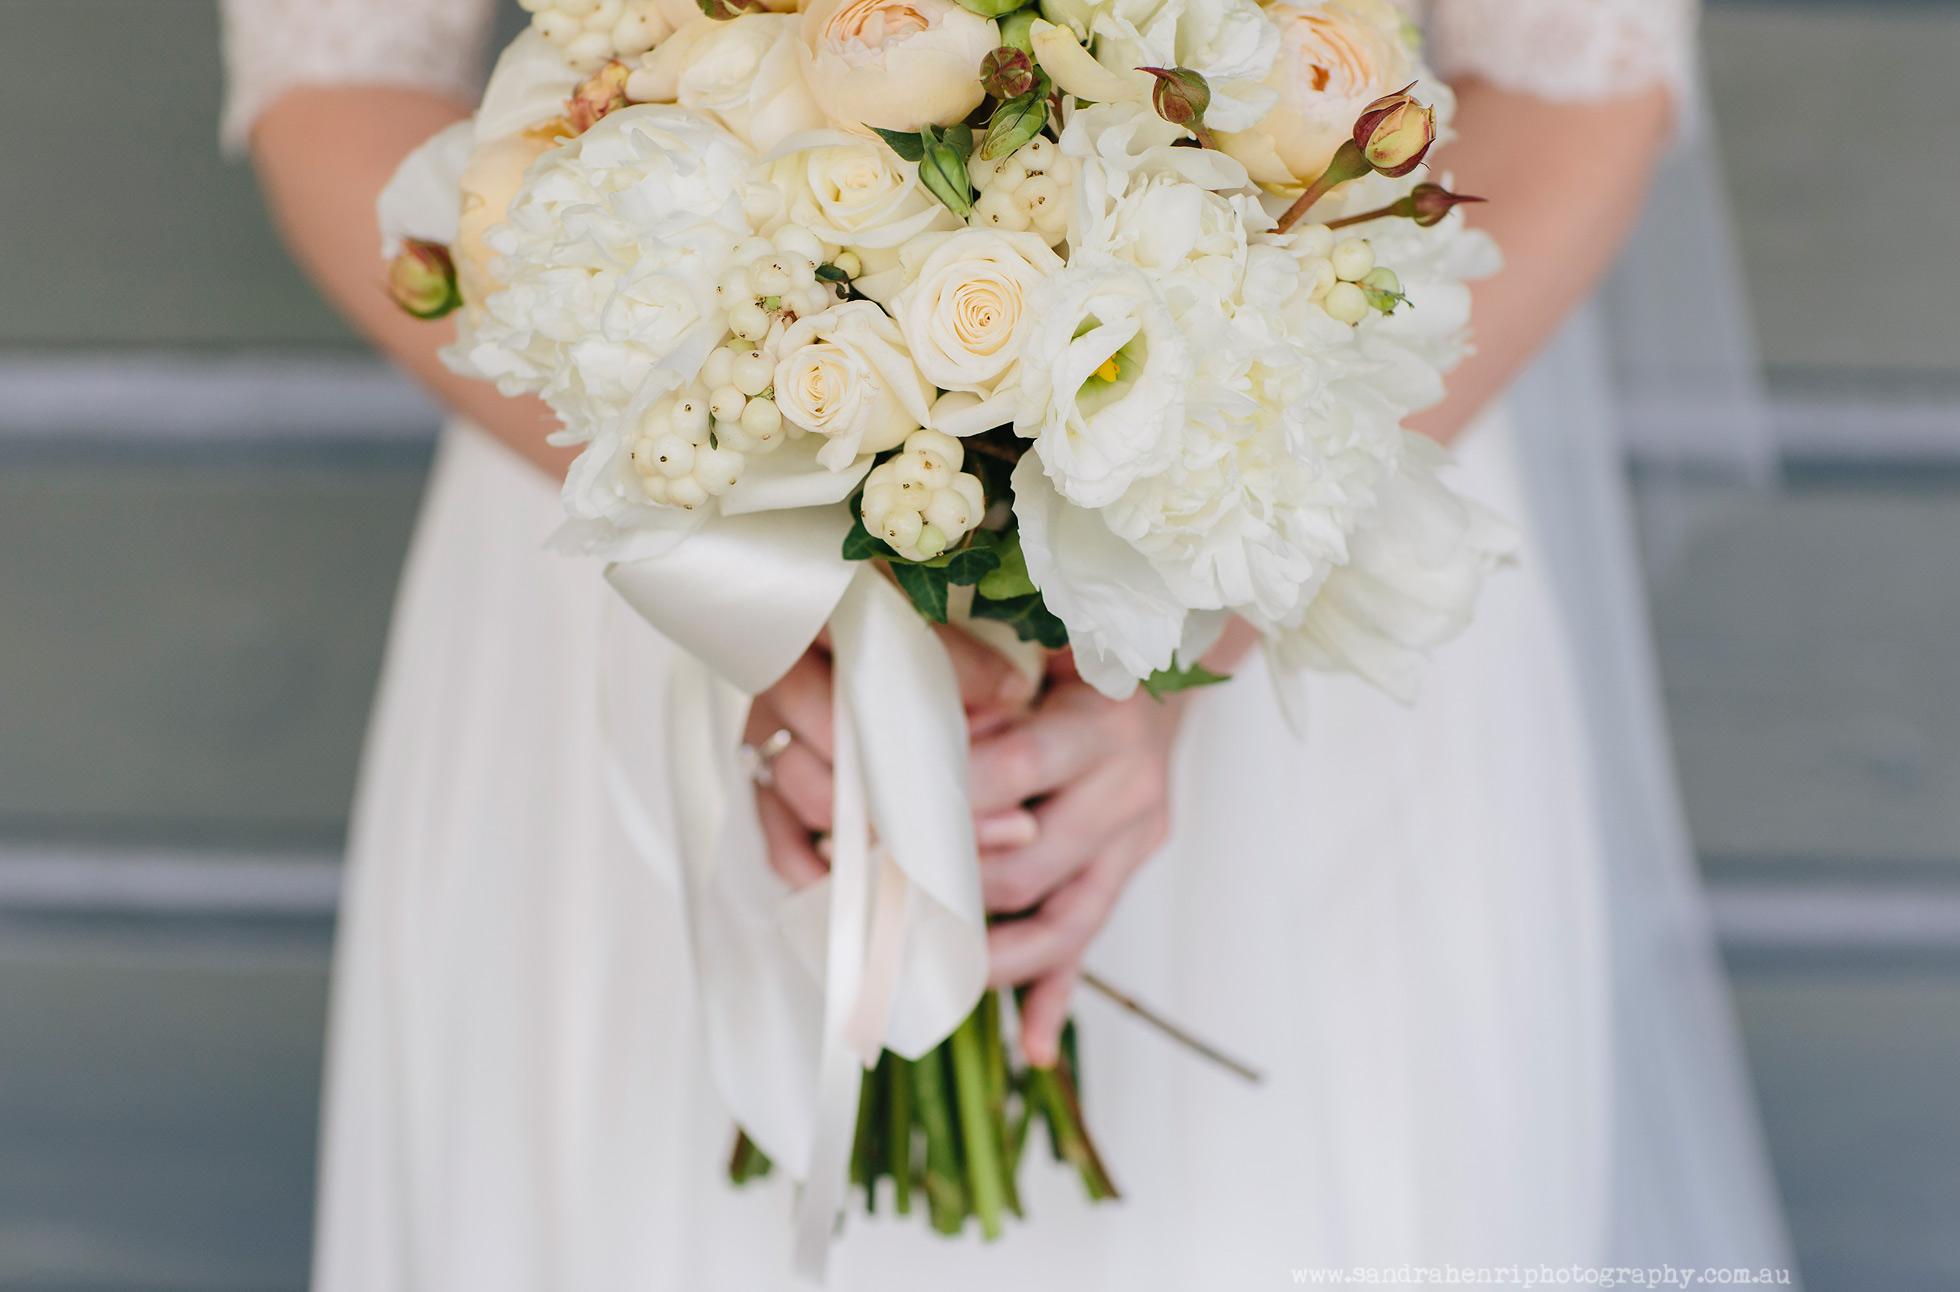 Roberts-Restaurant-garden-wedding-images-14.jpg